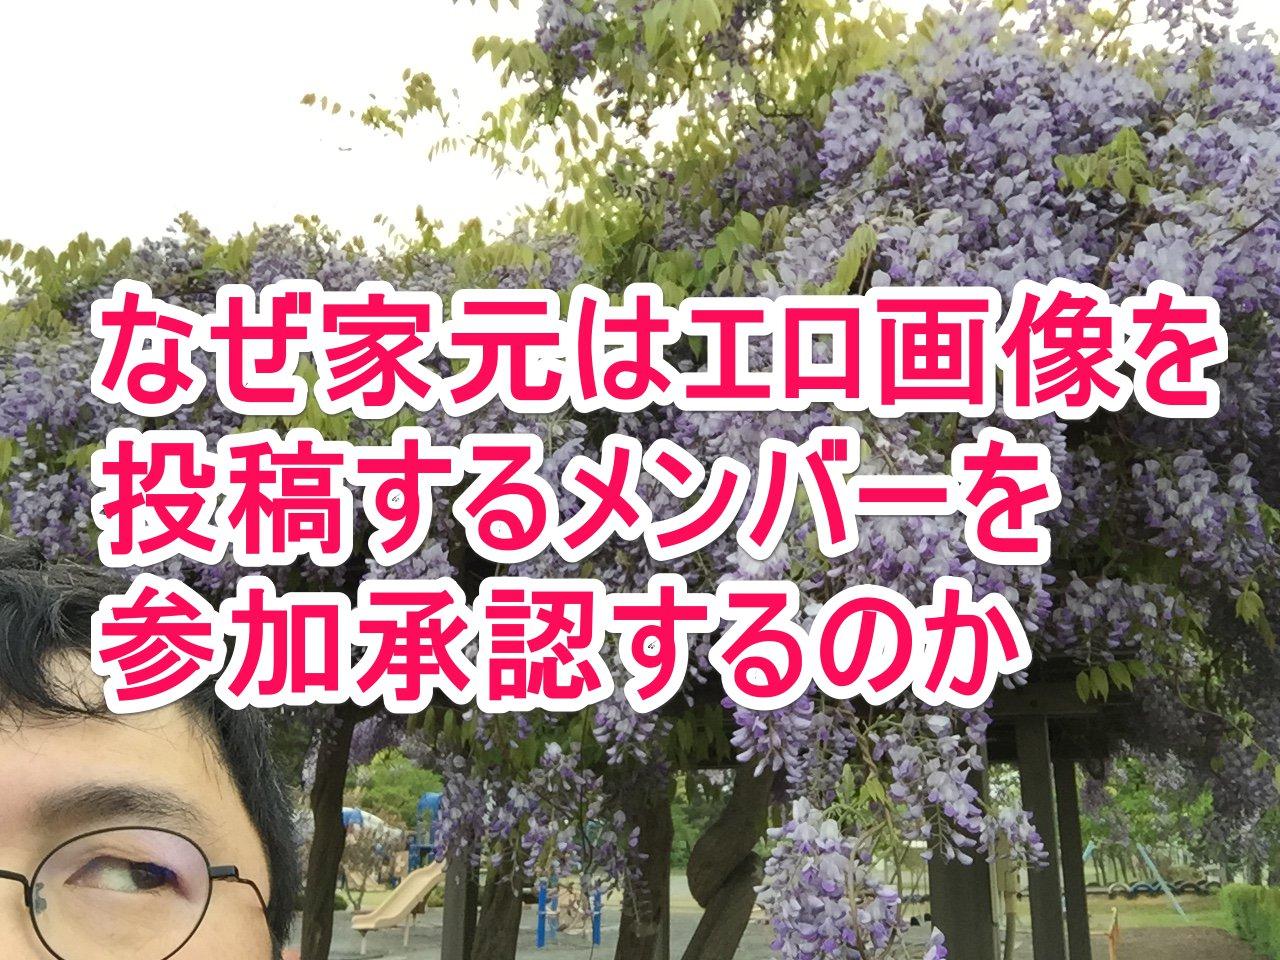 2015-05-12_06.01.38_051215_051606_PM